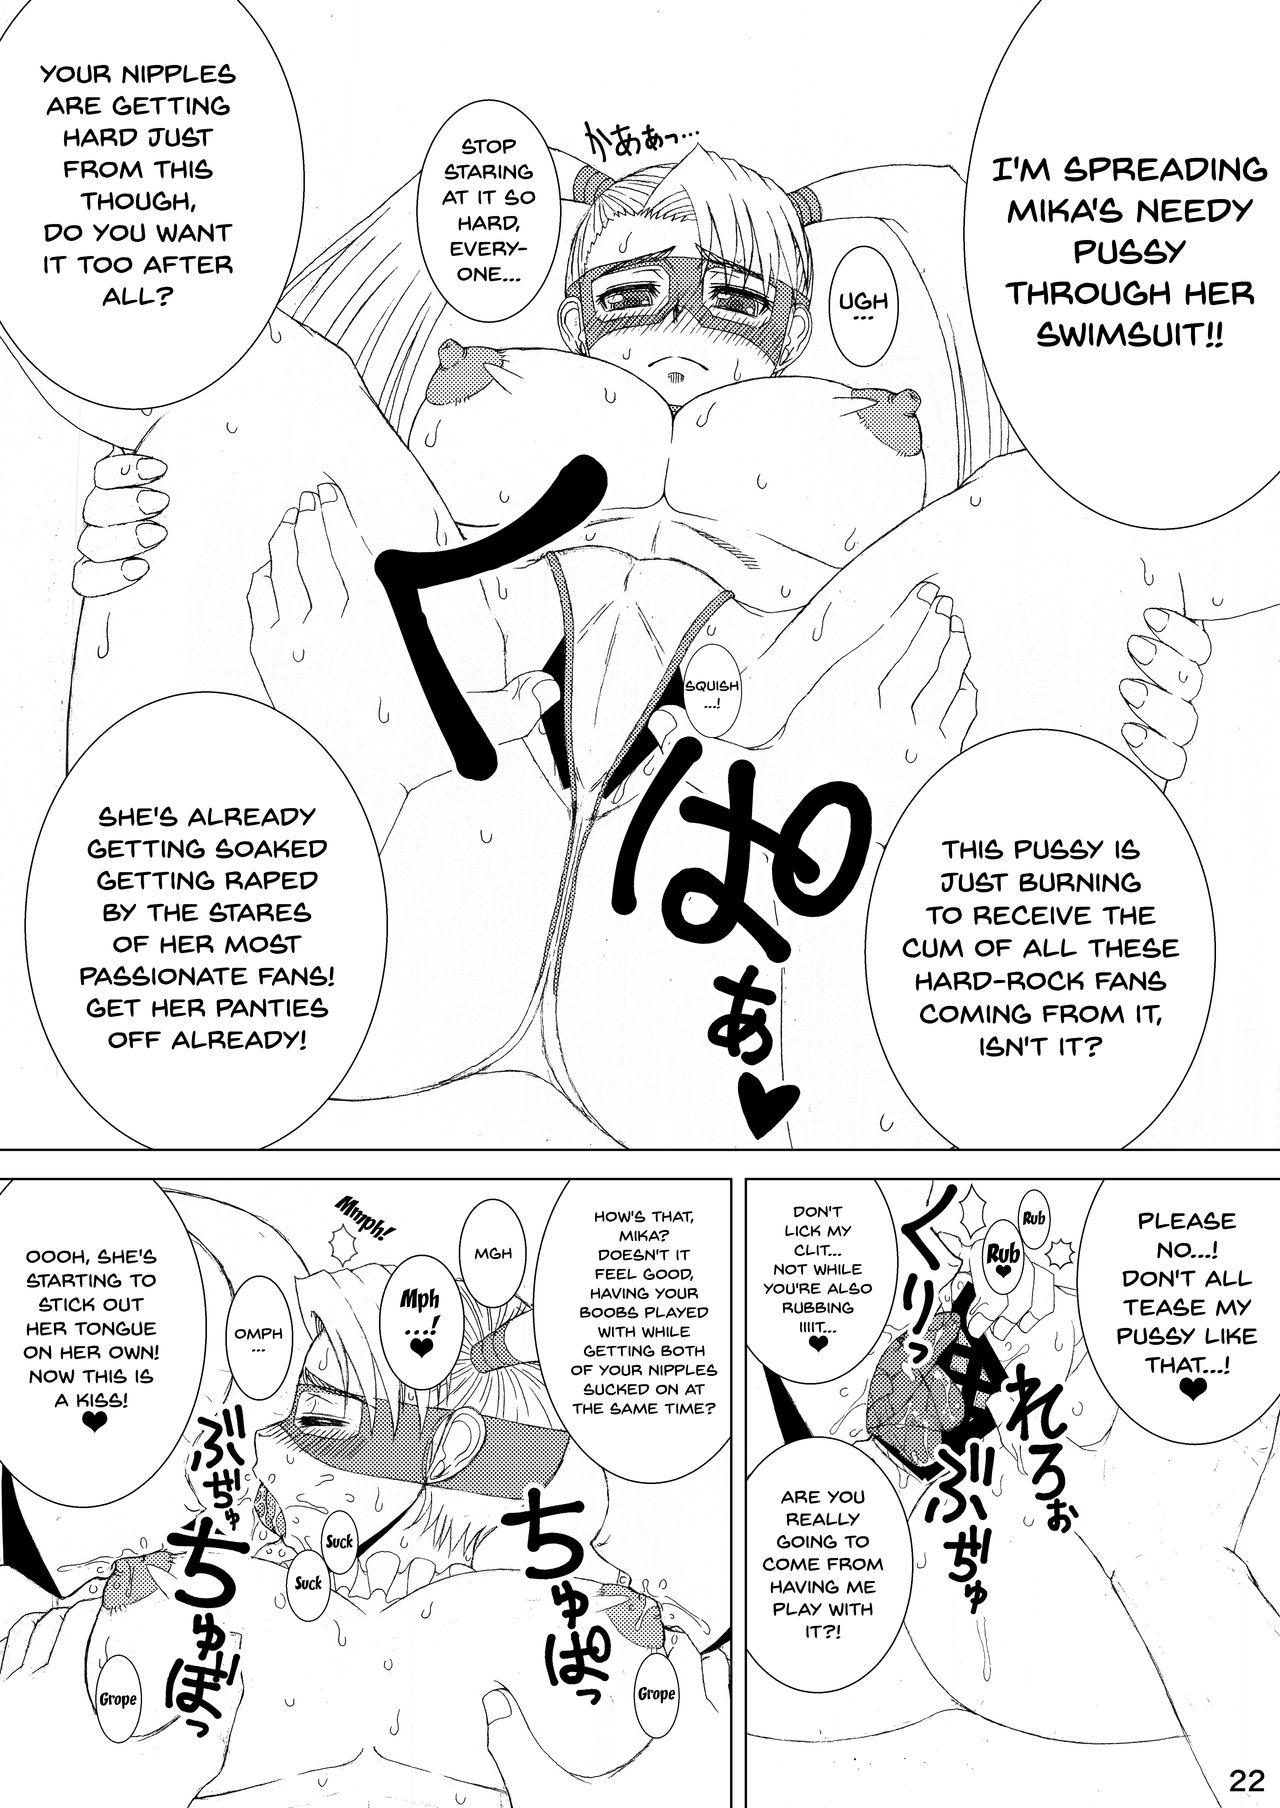 [POWERPLAY (Various)] CAPCOM (& MORE!) VS FIGHTING GIRLS Swimsuit & Gangbang Special (Various) [English] {Doujins.com} [Digital] 18